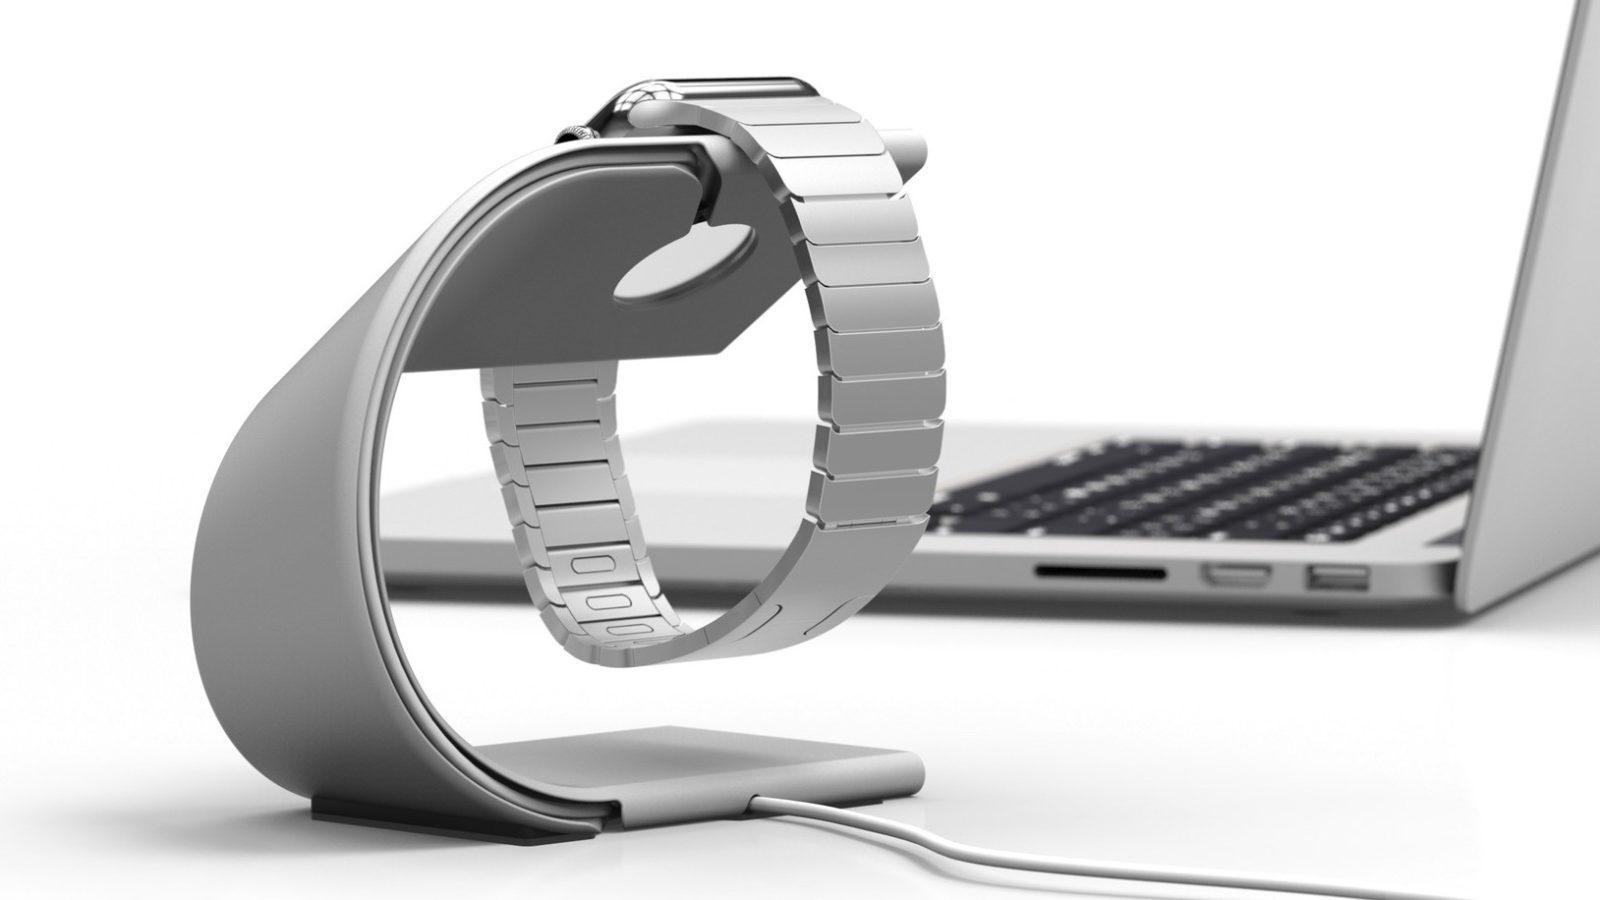 Nomad Black Friday Sale: Apple Watch Stand $40 (Reg. $60), Lightning cable carabiner $15 (Reg. $30)